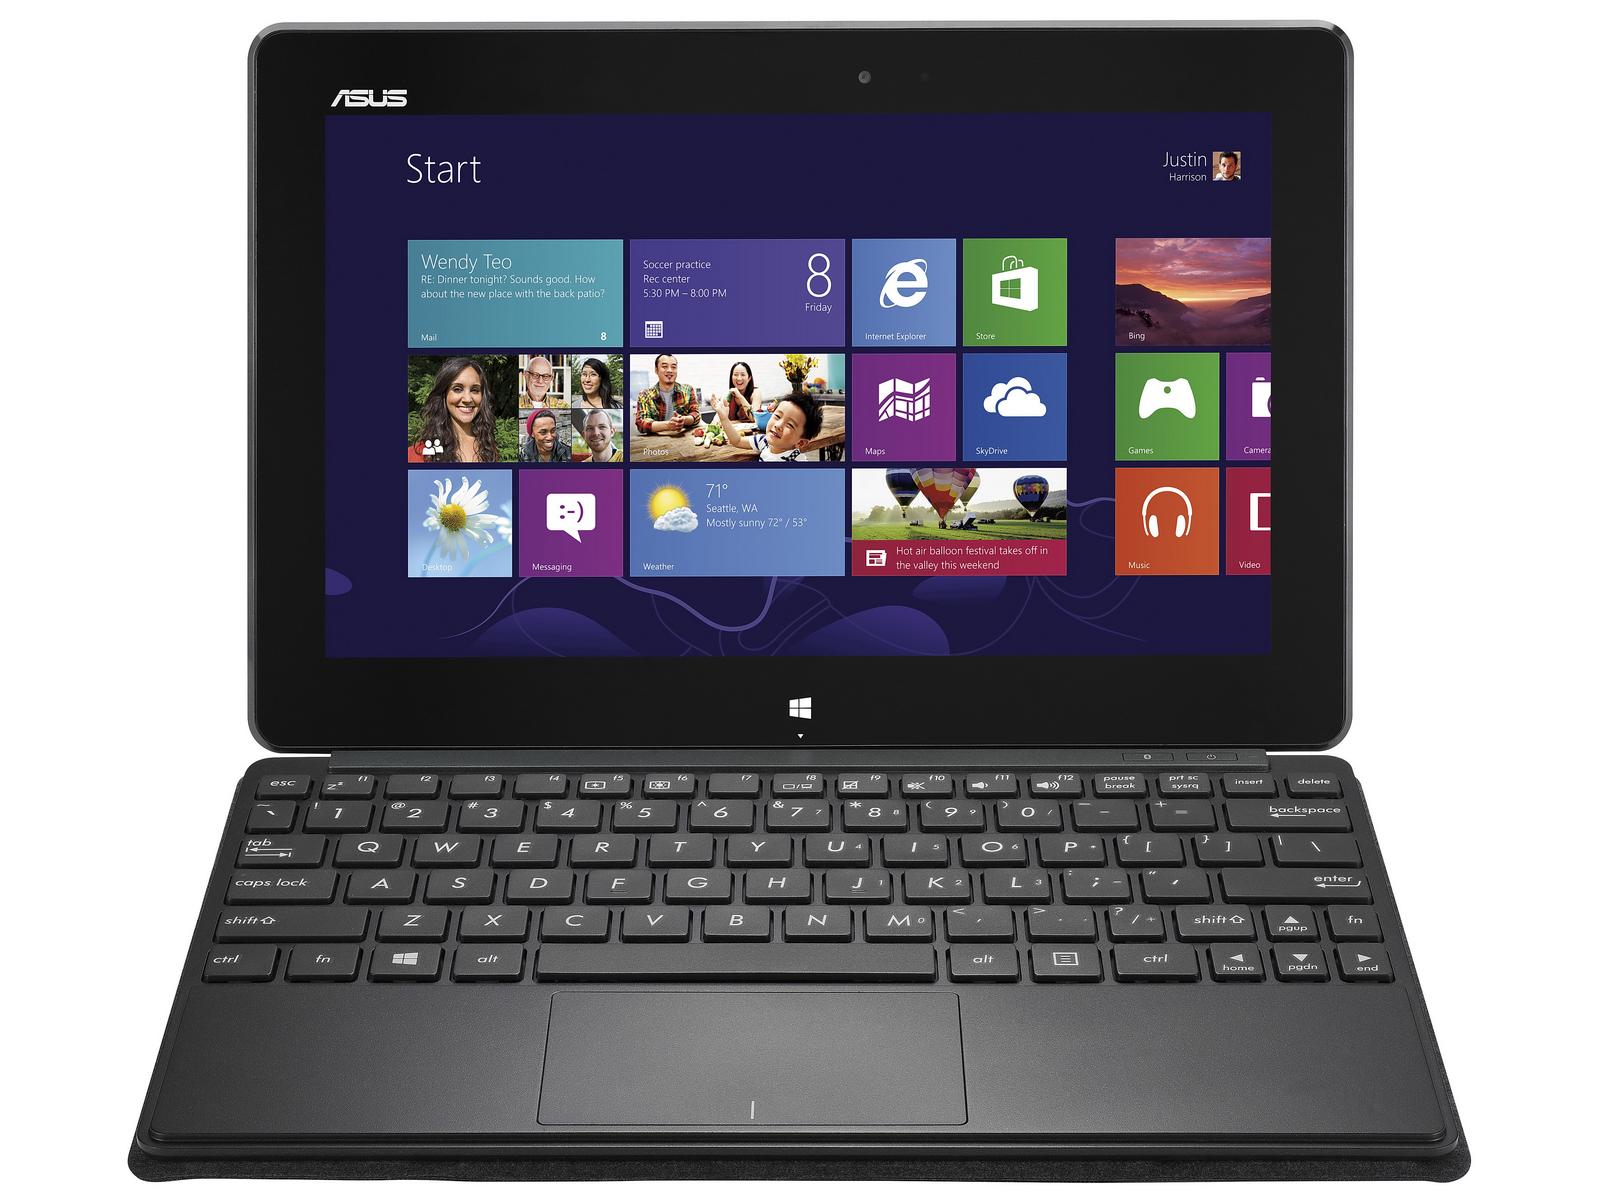 Asus launches Atom-powered VivoTab ME400C tablet